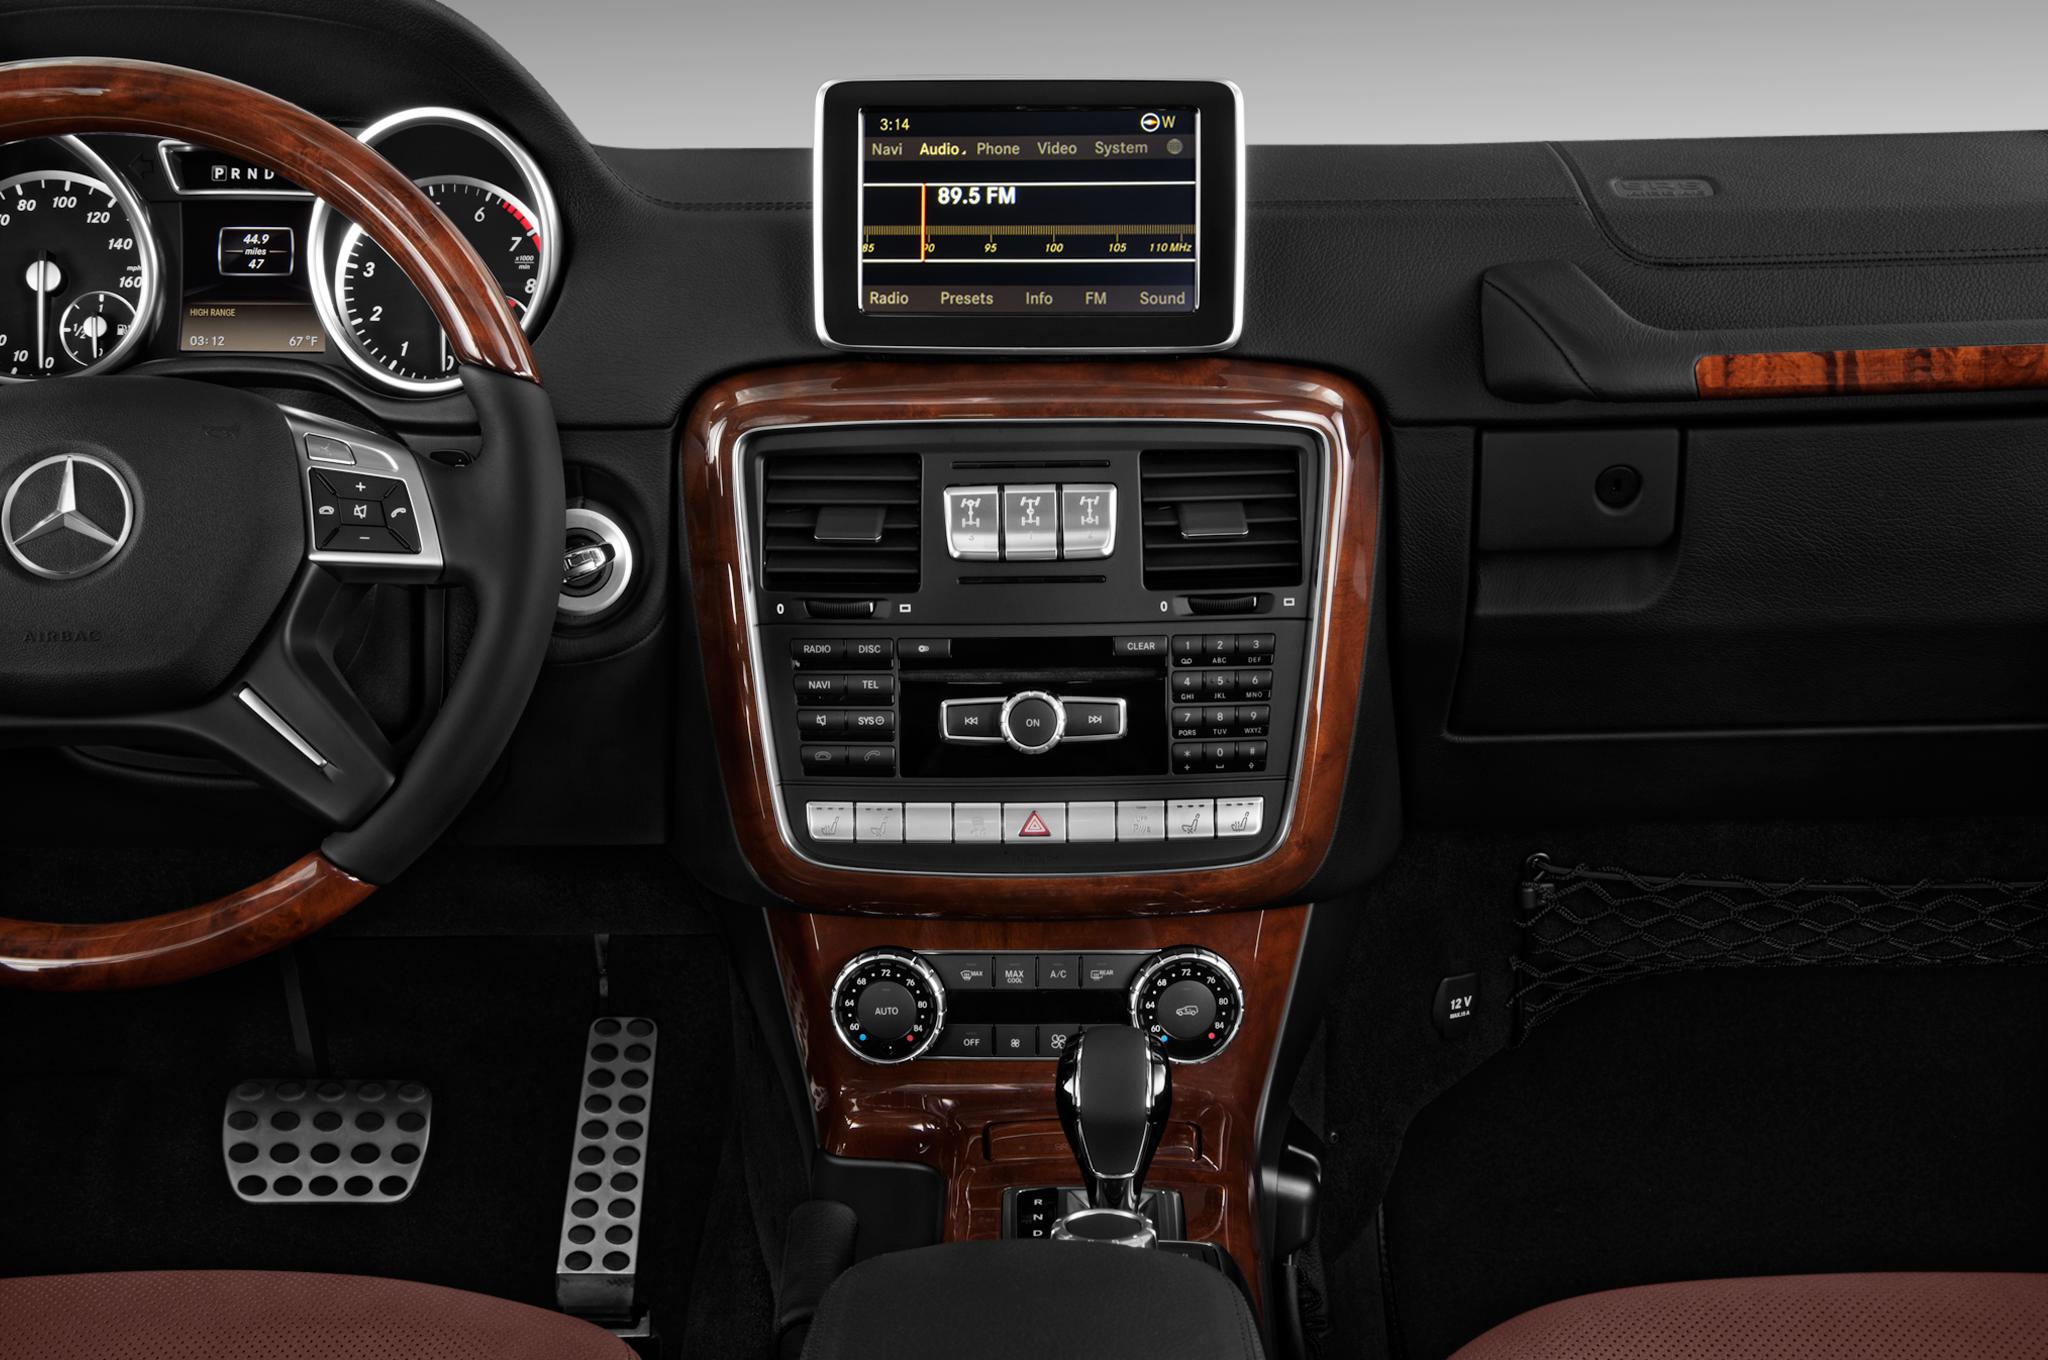 2012 mercedes benz g wagon professional edition grey exterior 4252 - G Wagon Matte Black Interior